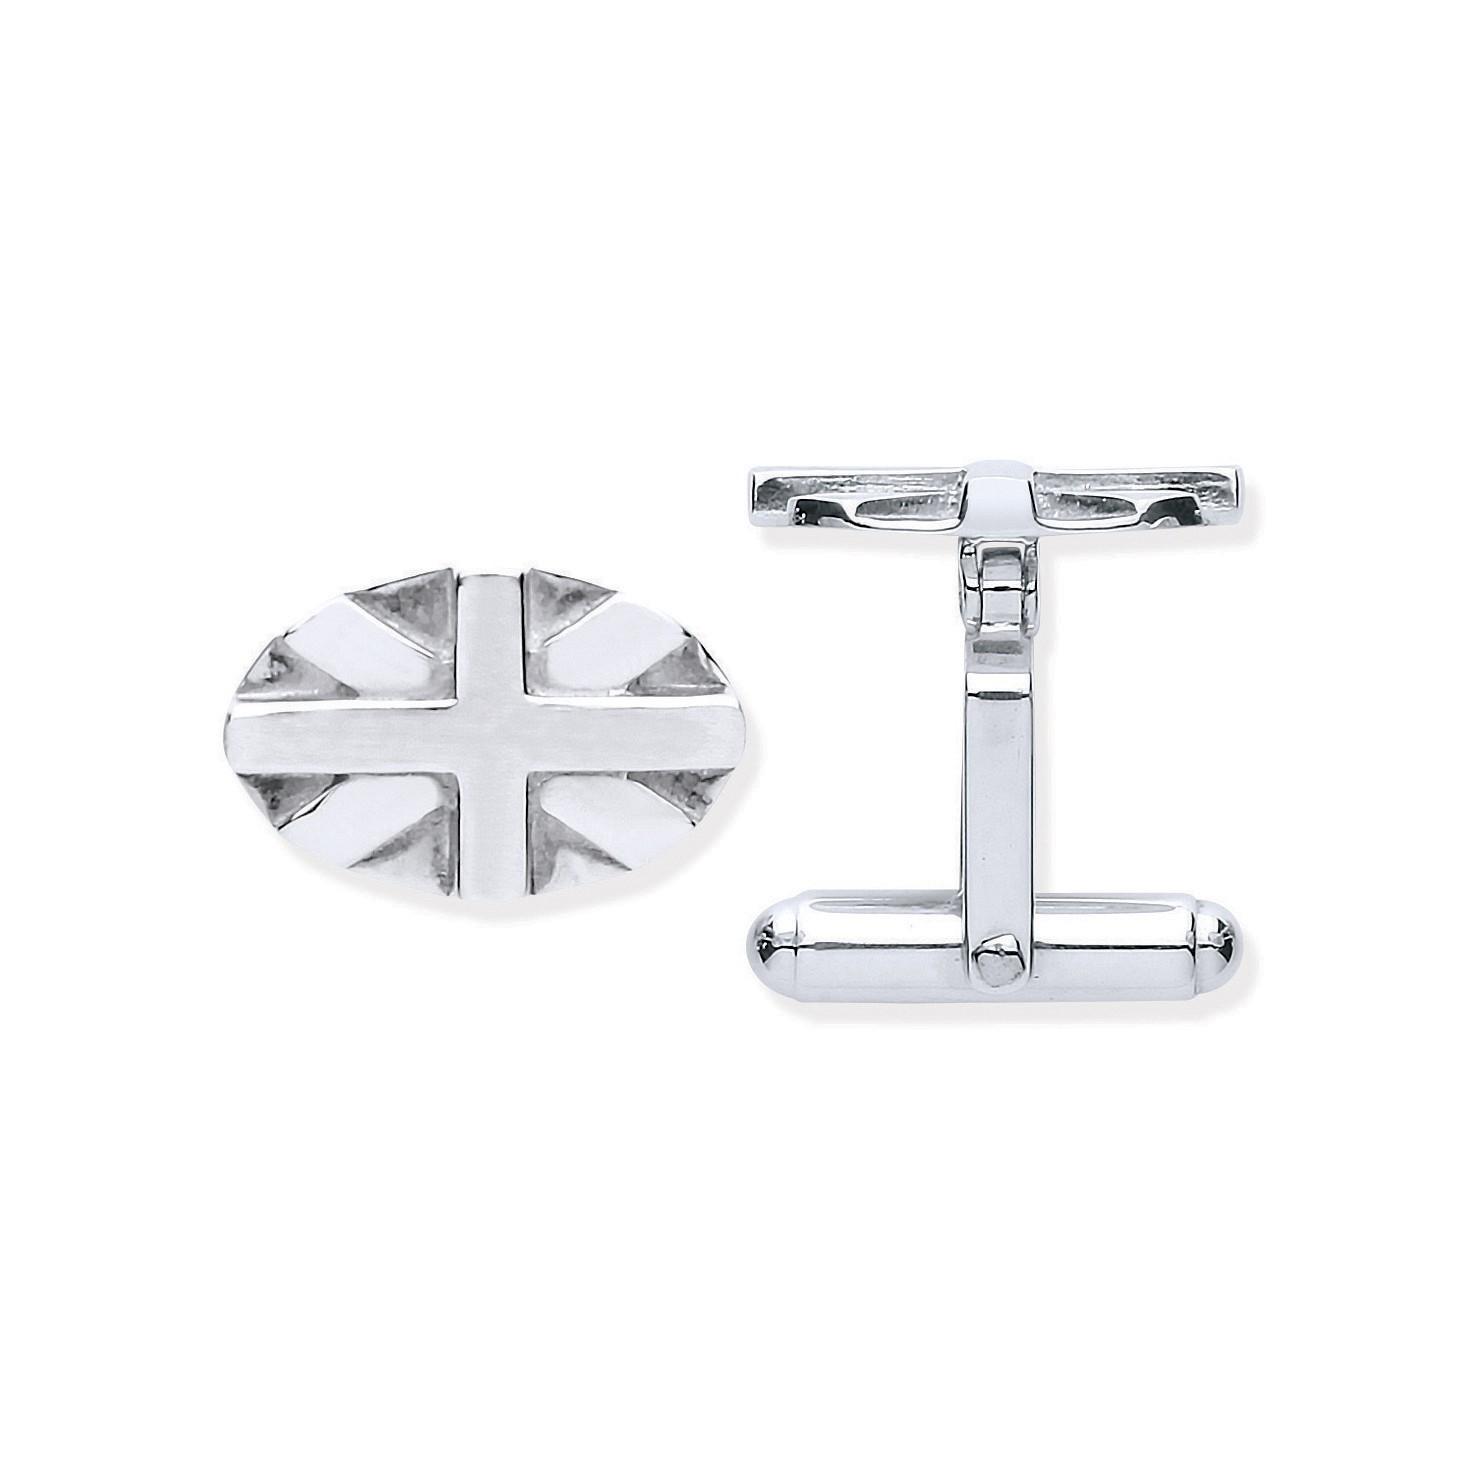 Silver Union Jack Oval Cufflinks